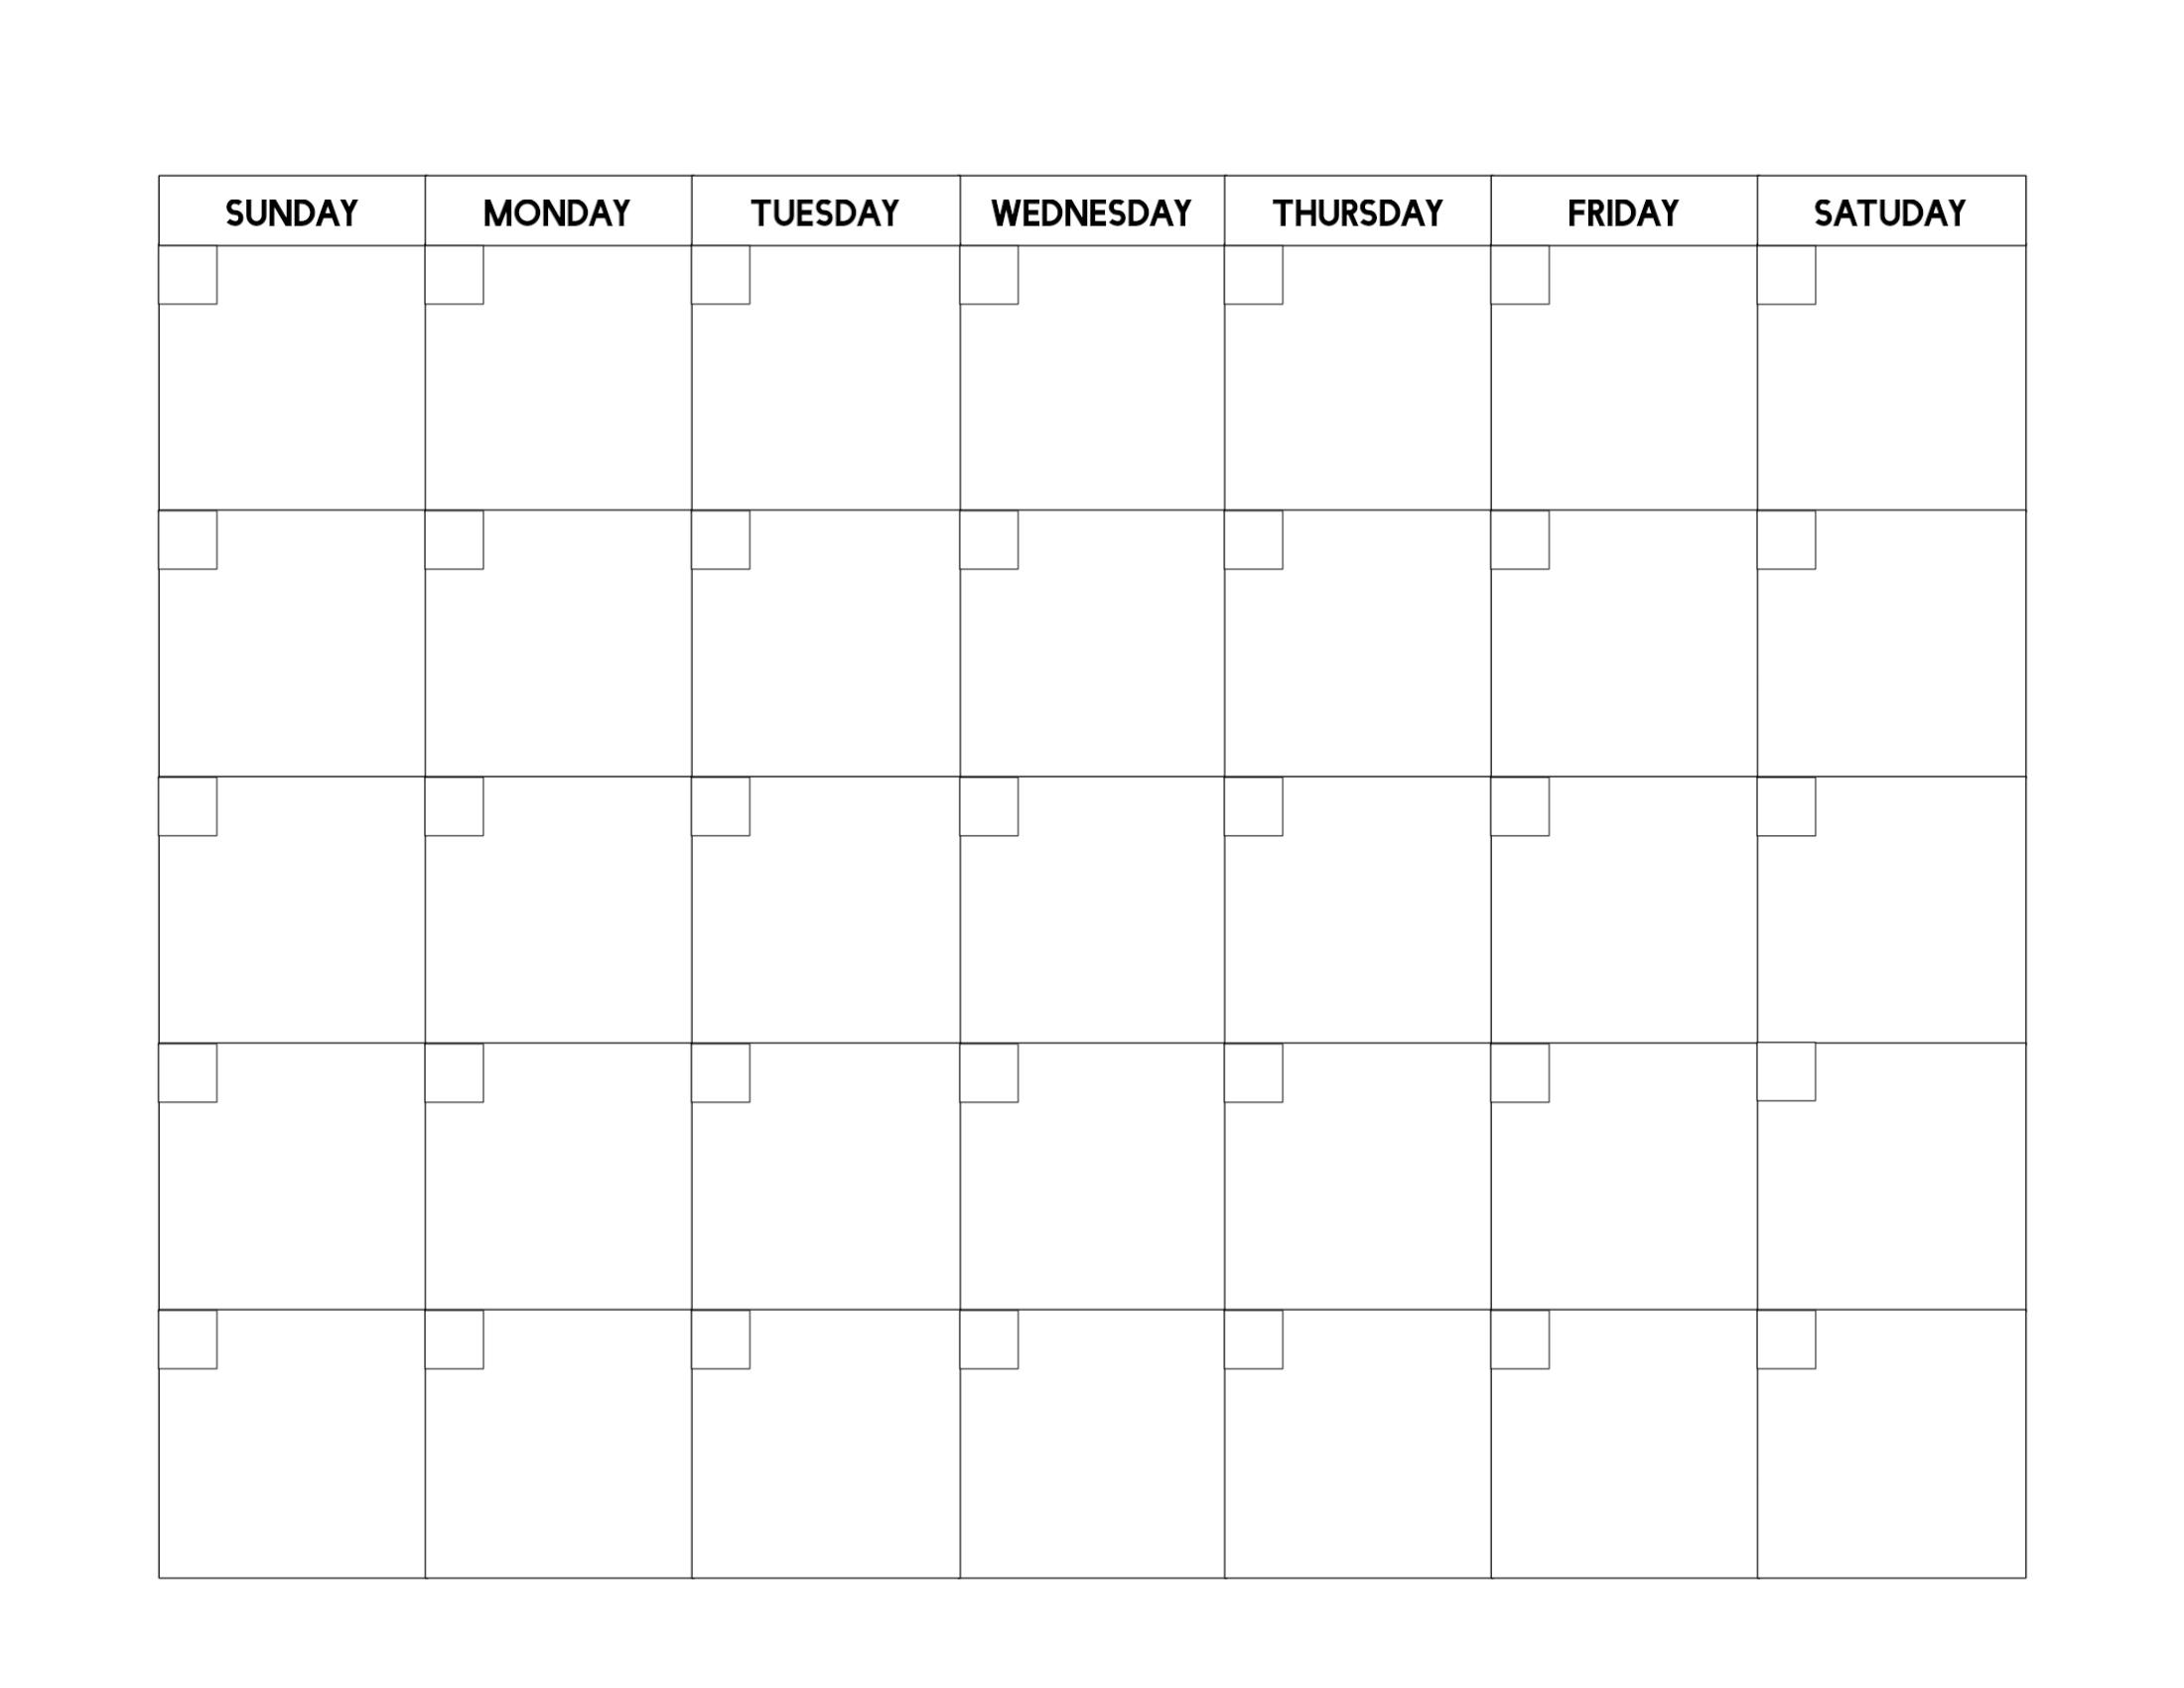 Free Printable Blank Calendar Template - Paper Trail Design Blank Calendar Page No Datea